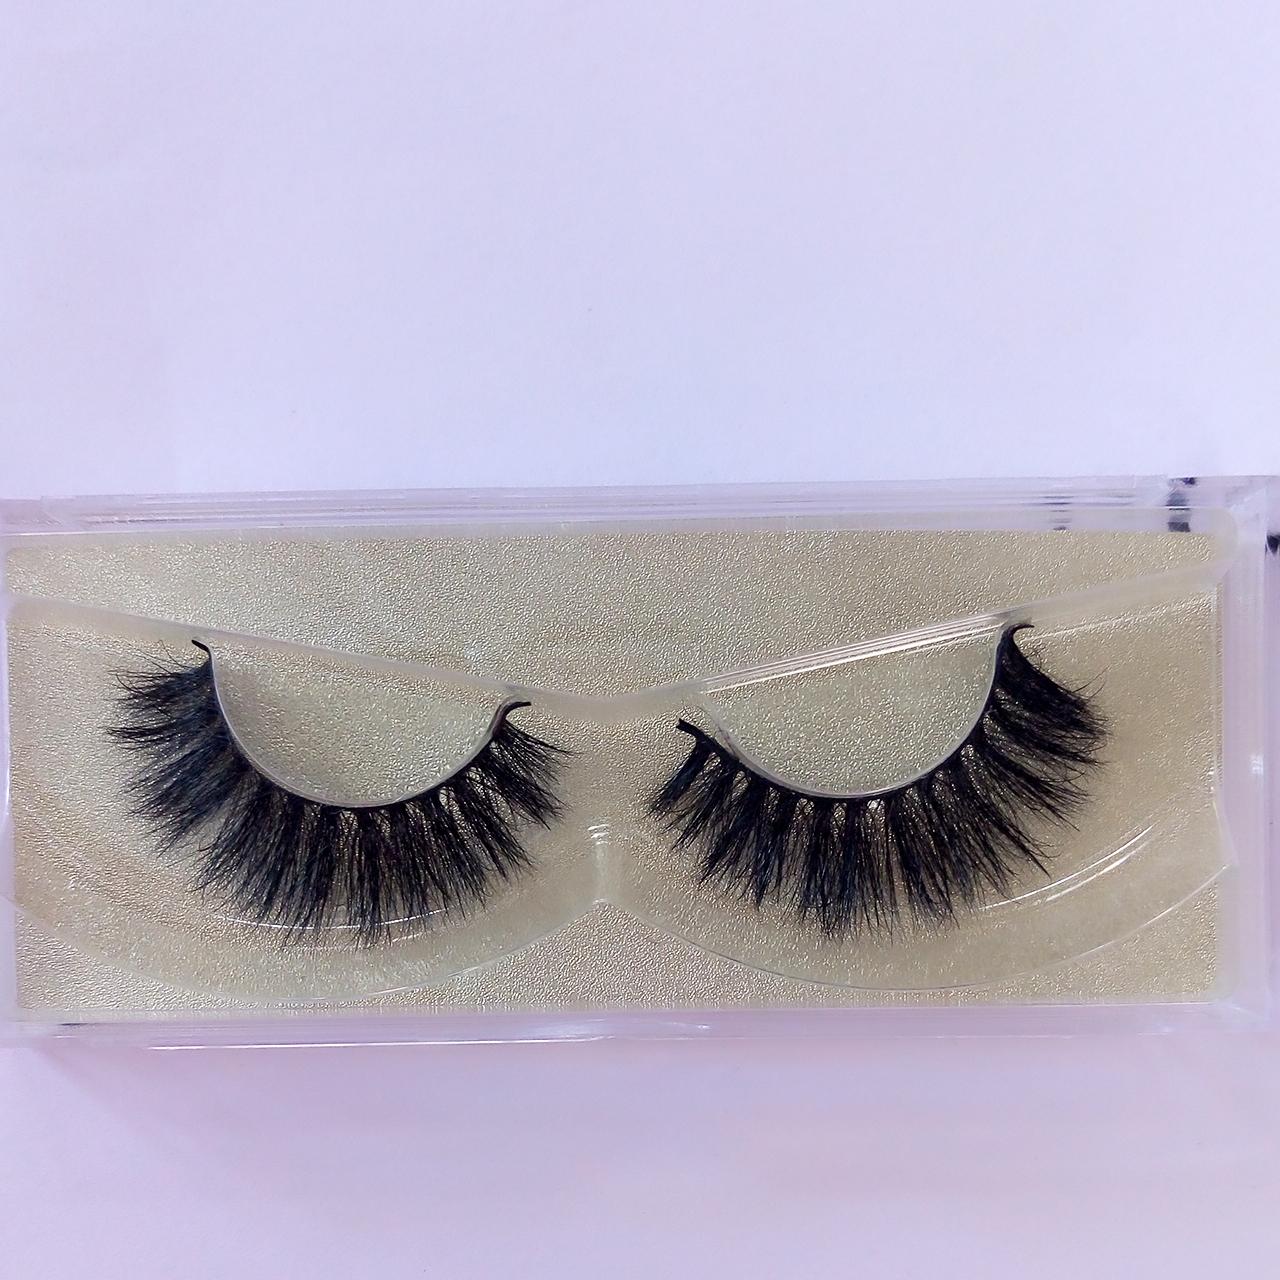 3D mink lashes handmade  Cruelty-free false eyelash